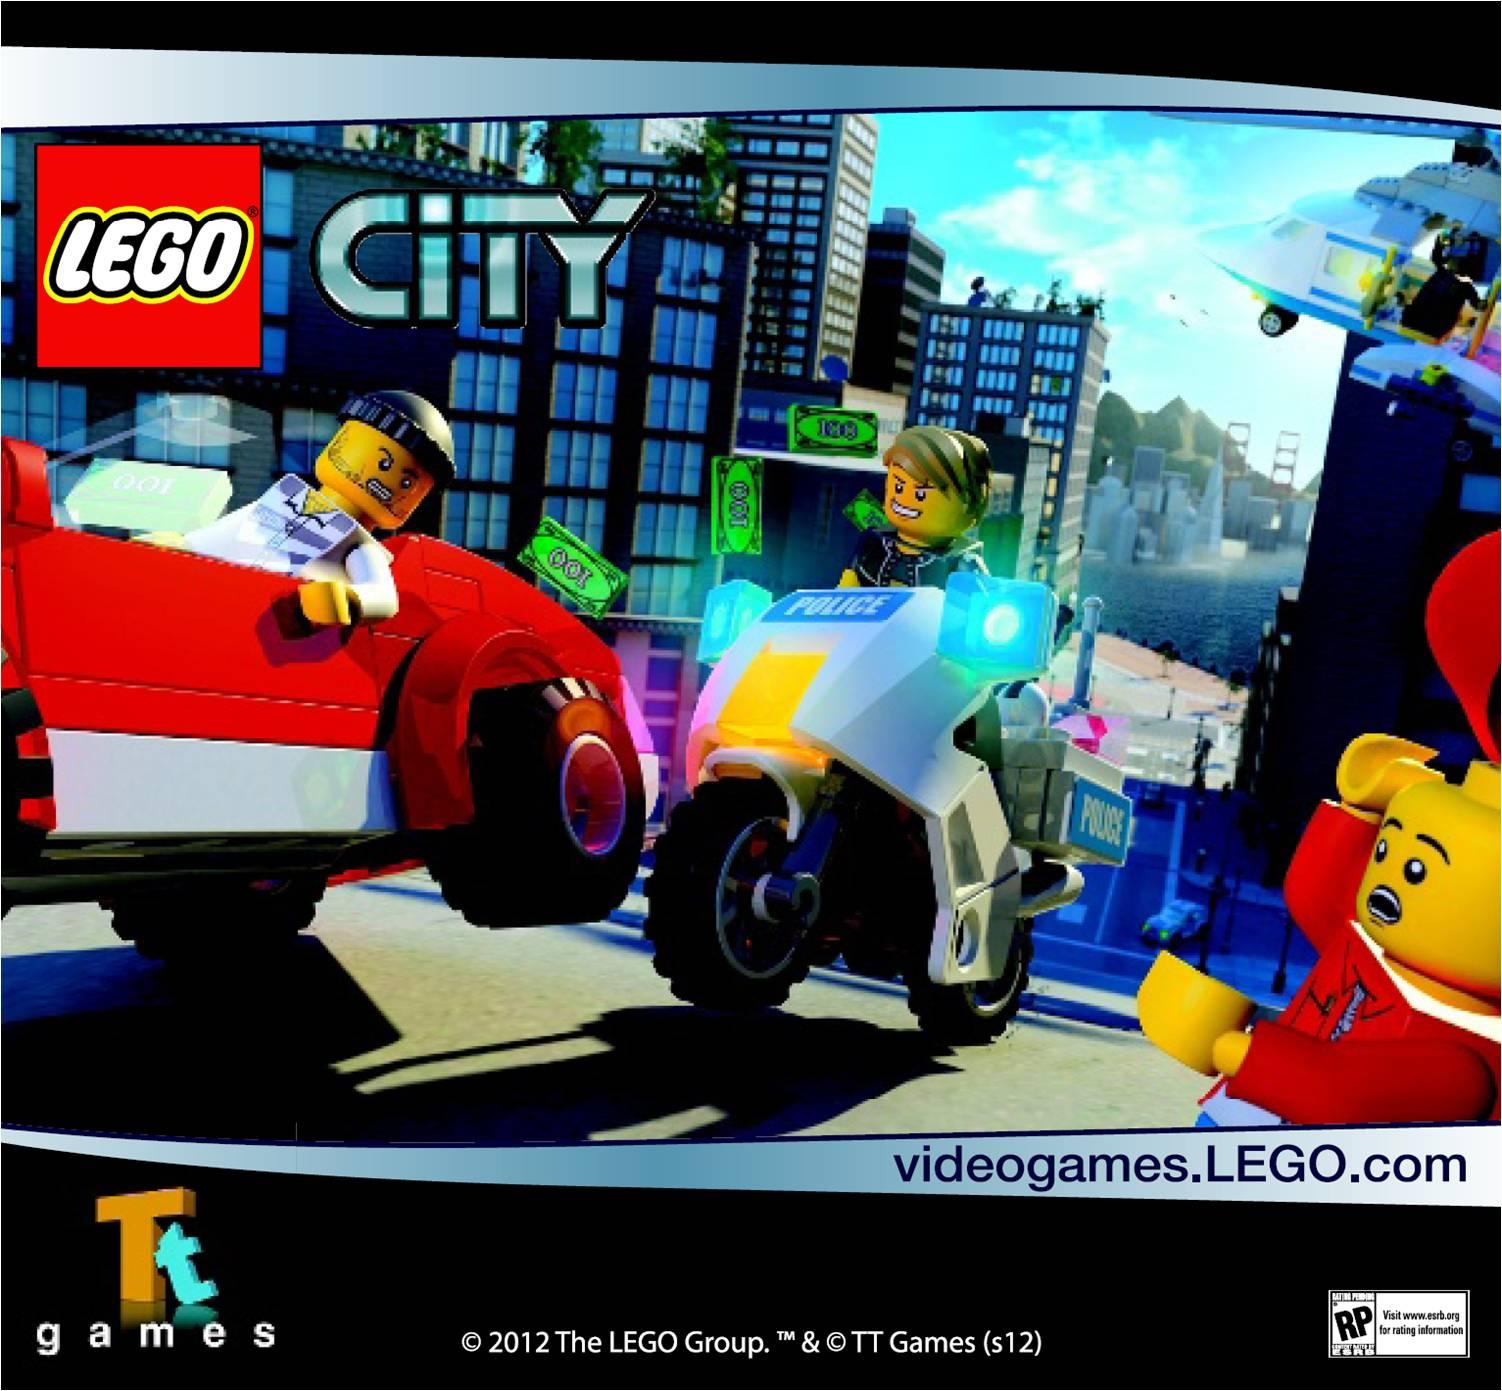 Lego city game.jpg